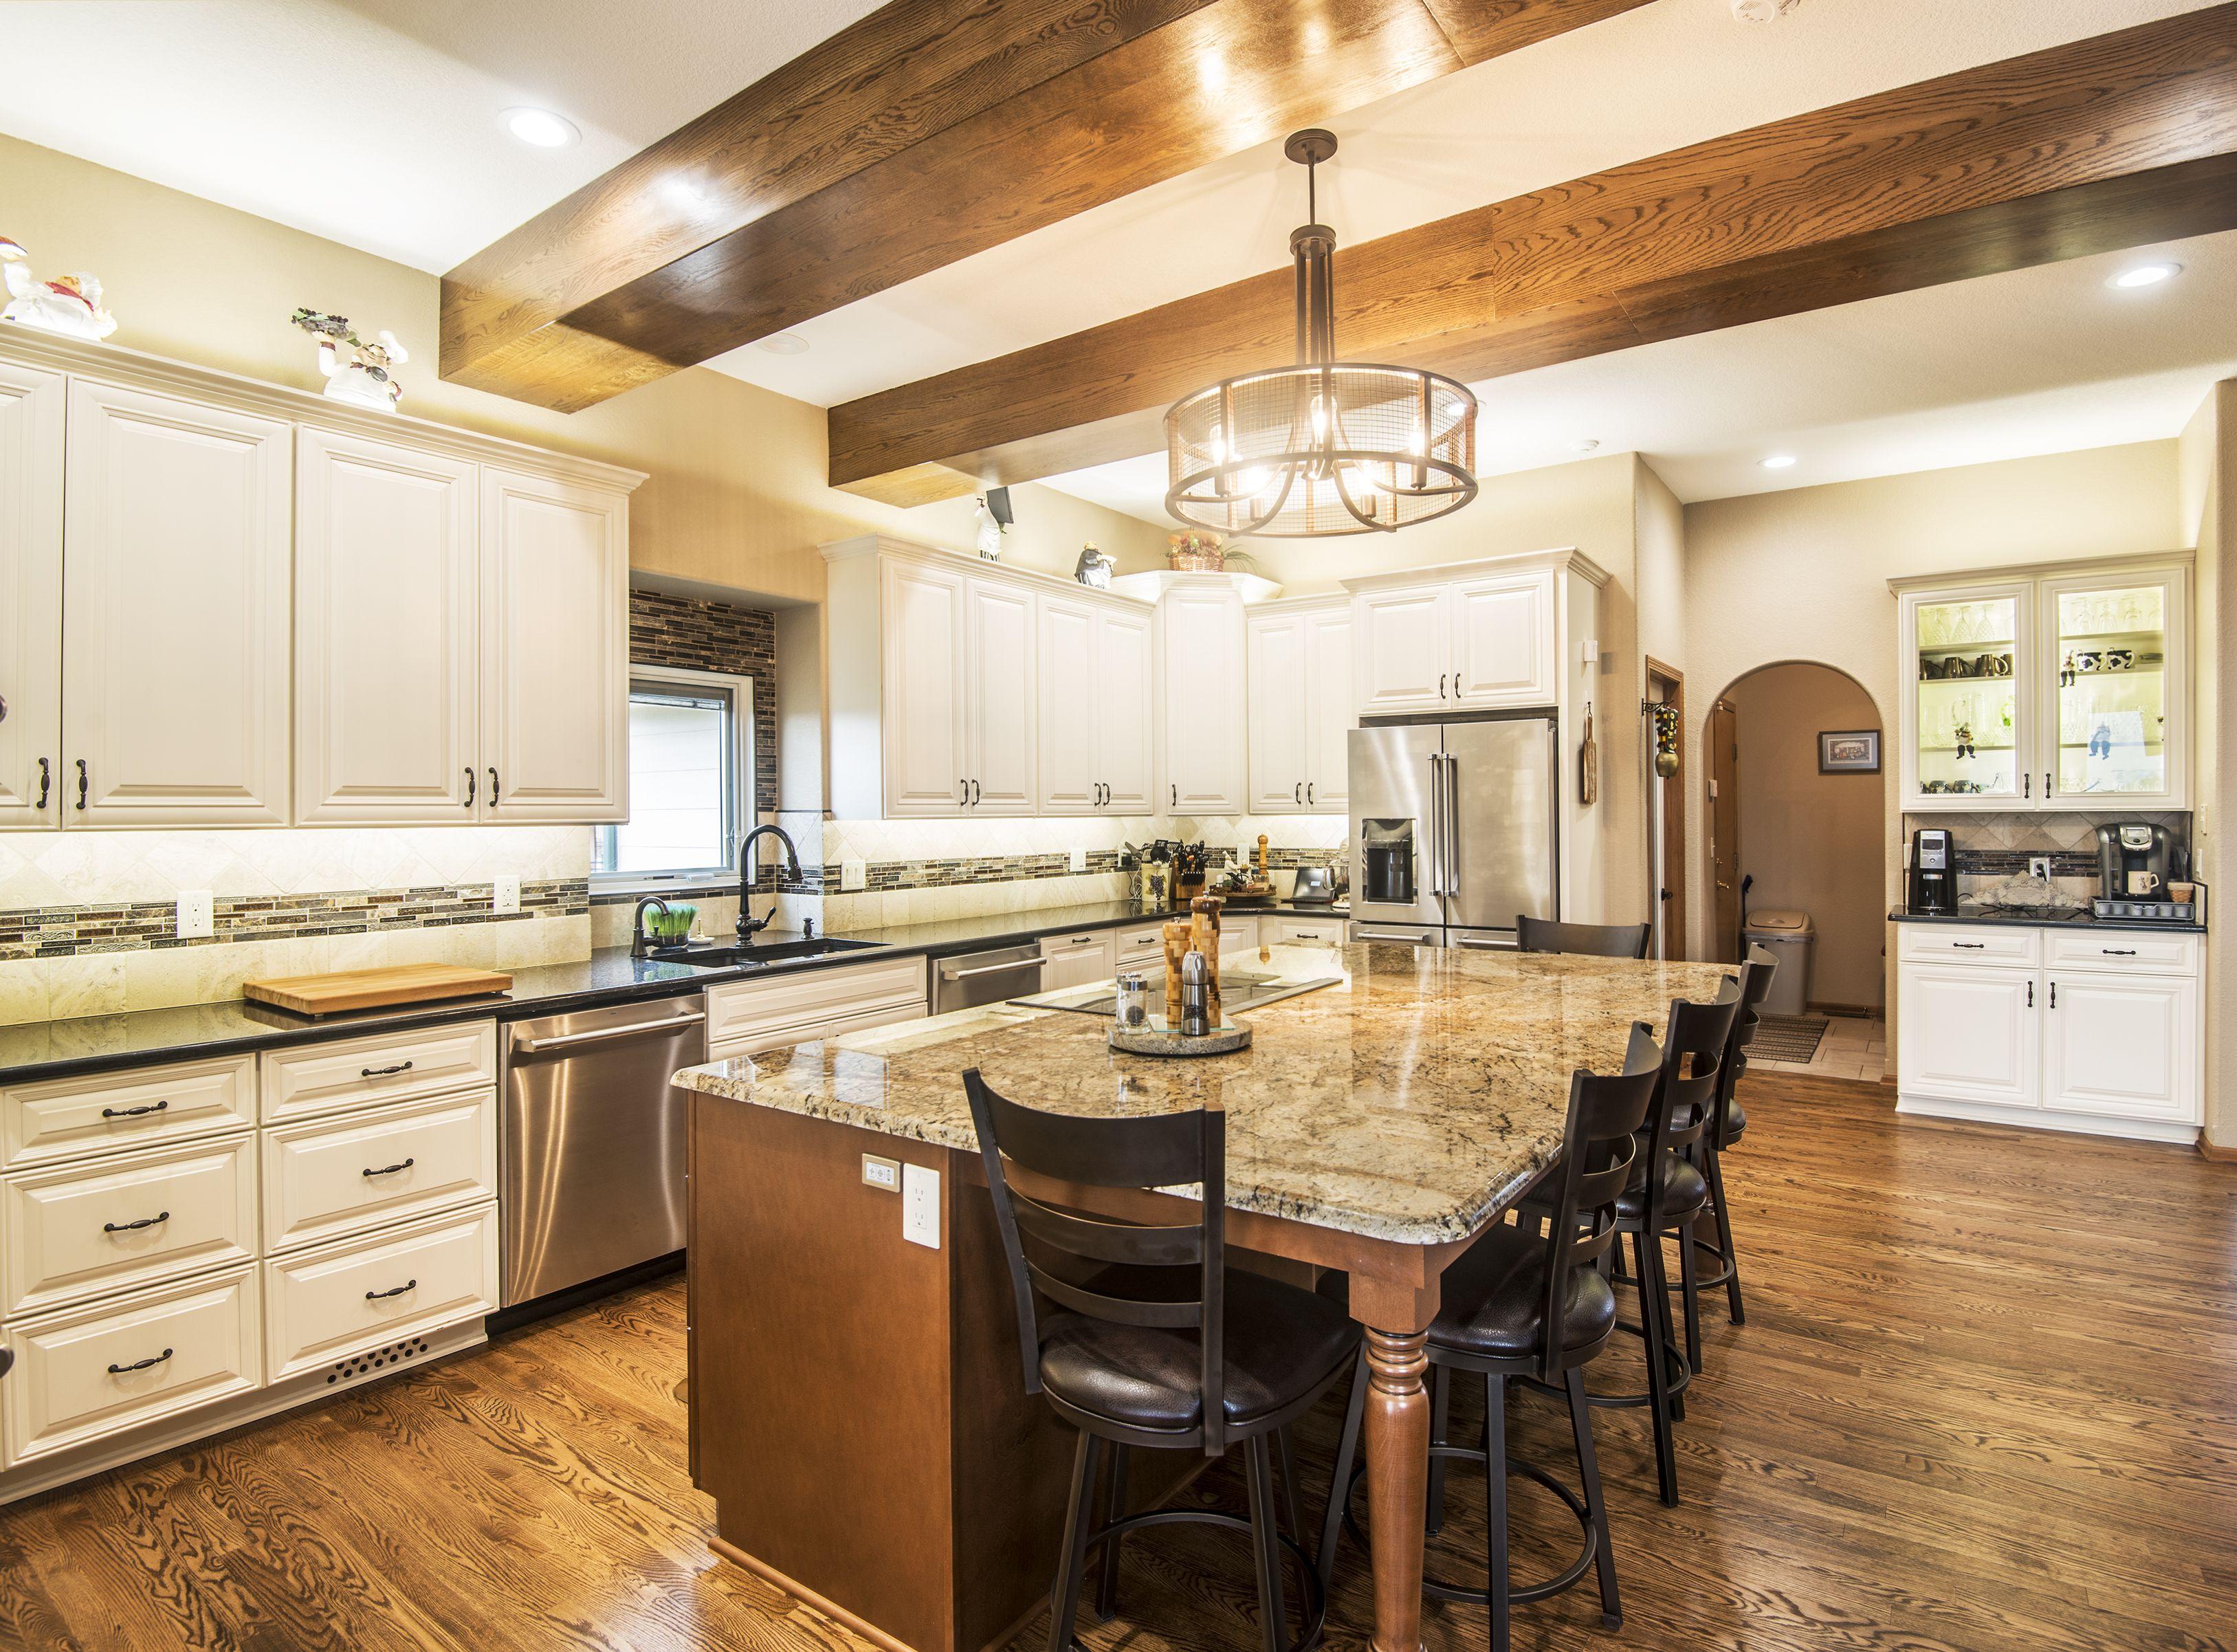 Kitchen Tune Up Wichita Ks New Cabinets In 2020 Custom Cabinets Cool Kitchens Beautiful Kitchens